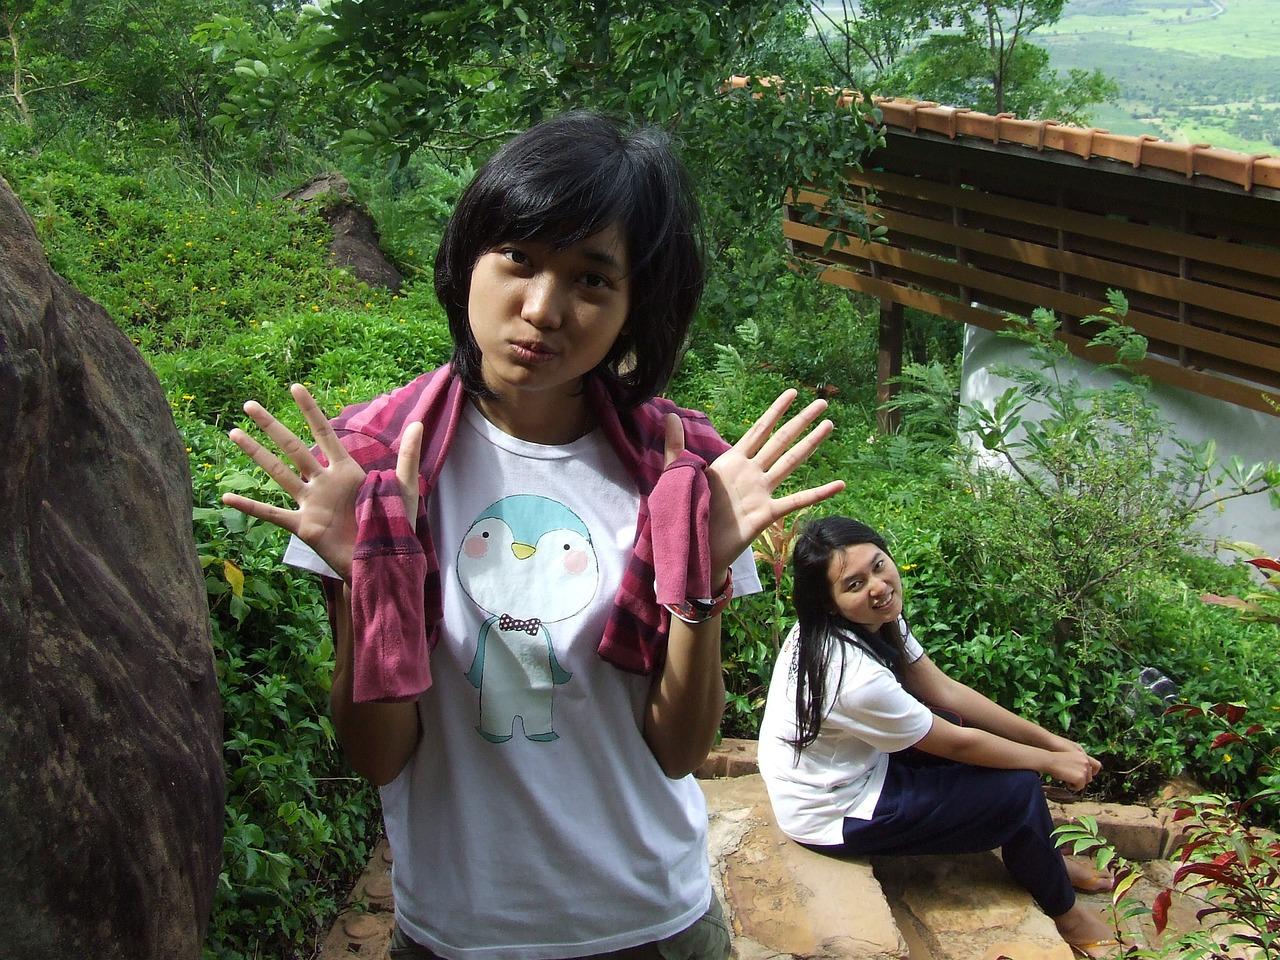 Free thai girl, wwe divas pantsed naked